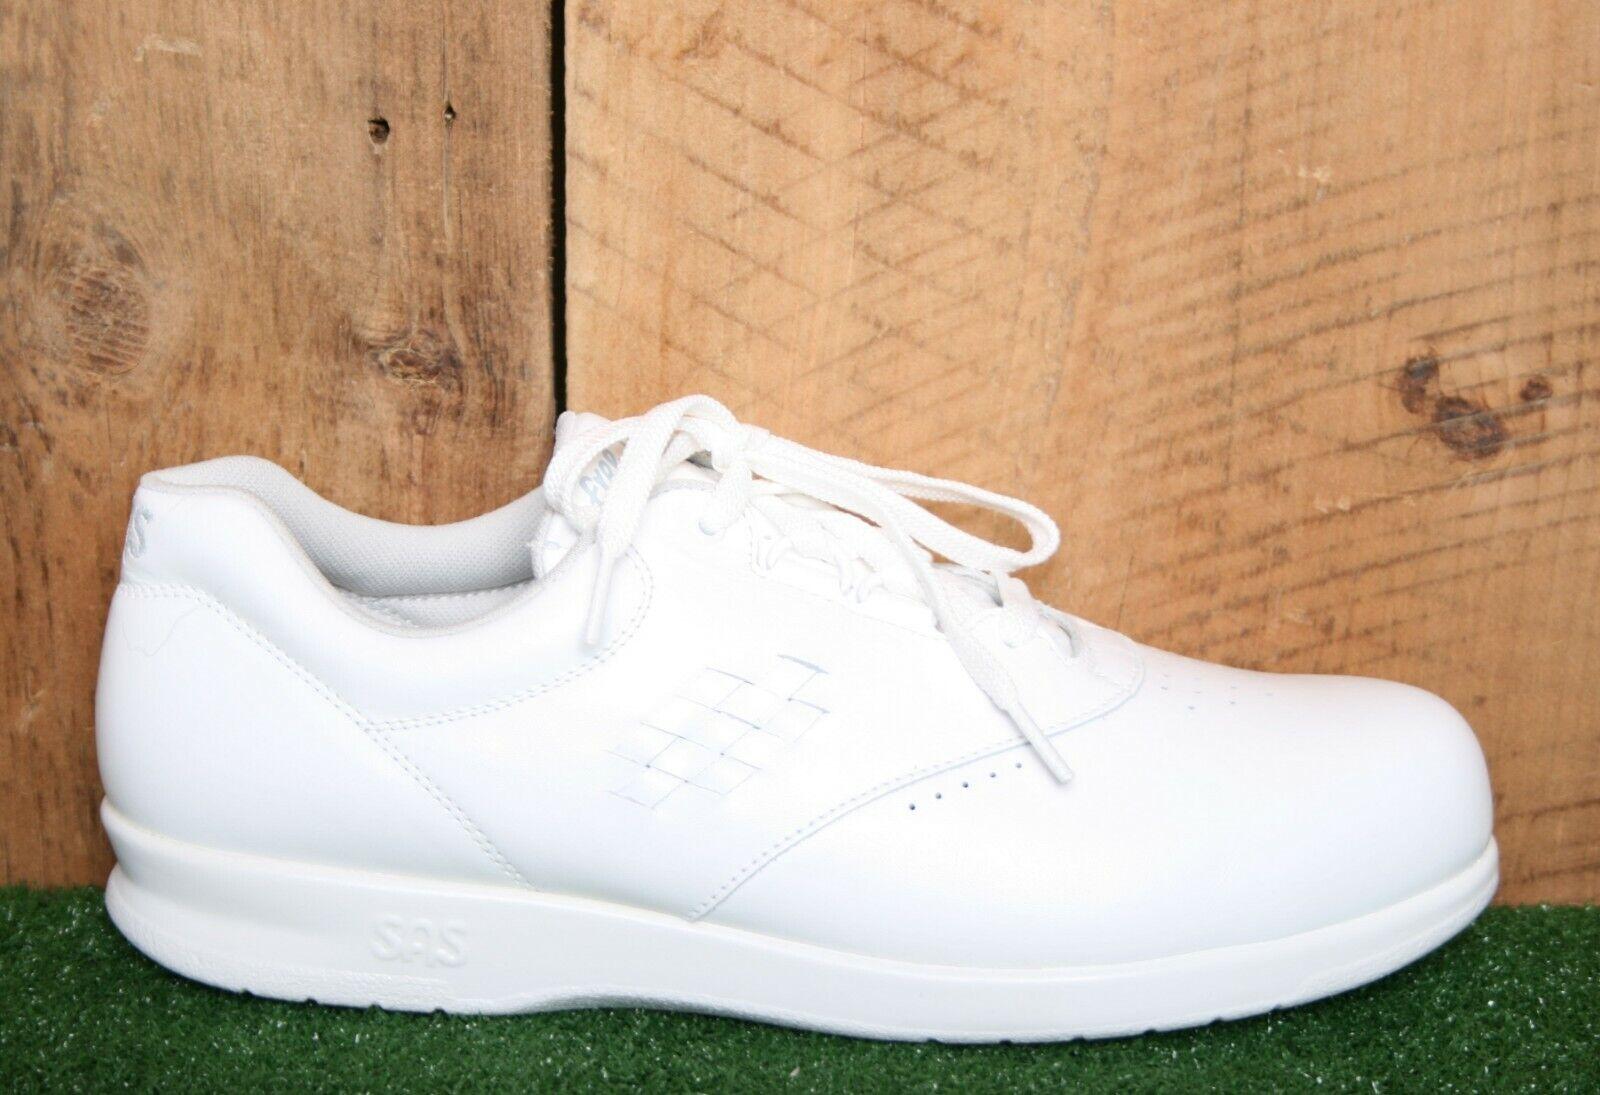 SAS'Free Time 'bianca Leather Oxfords Comfort Walking scarpe  Wouomo Sz.10.5 M  più economico